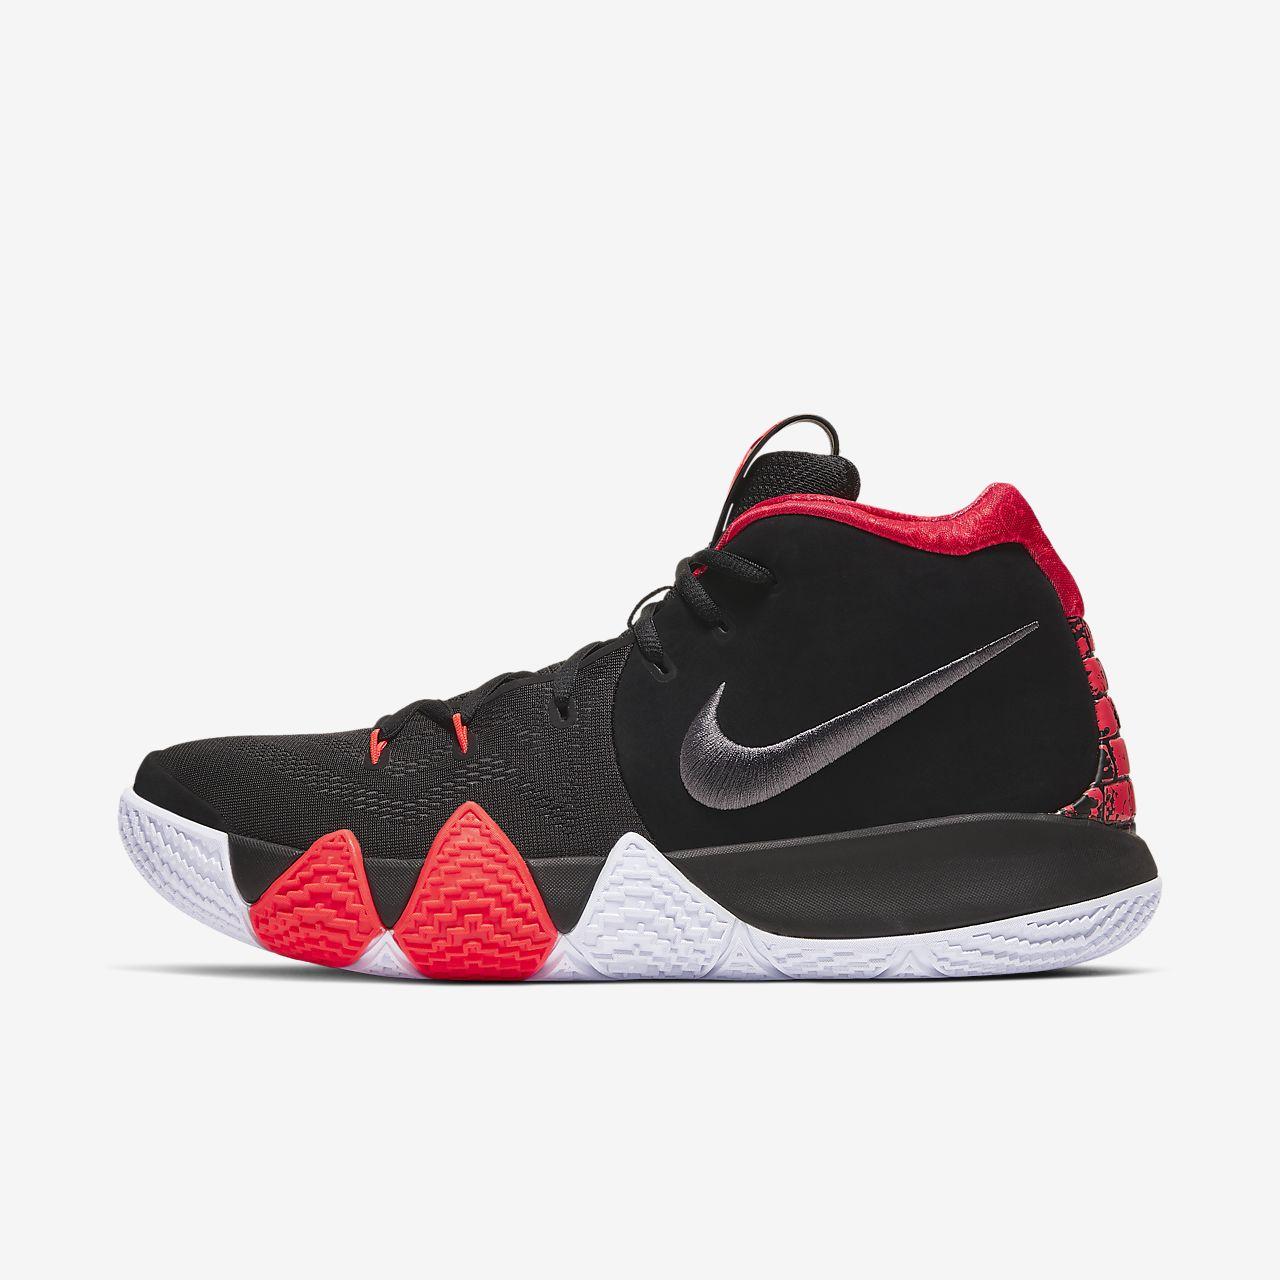 Low Resolution Kyrie 4 Basketball Shoe Kyrie 4 Basketball Shoe